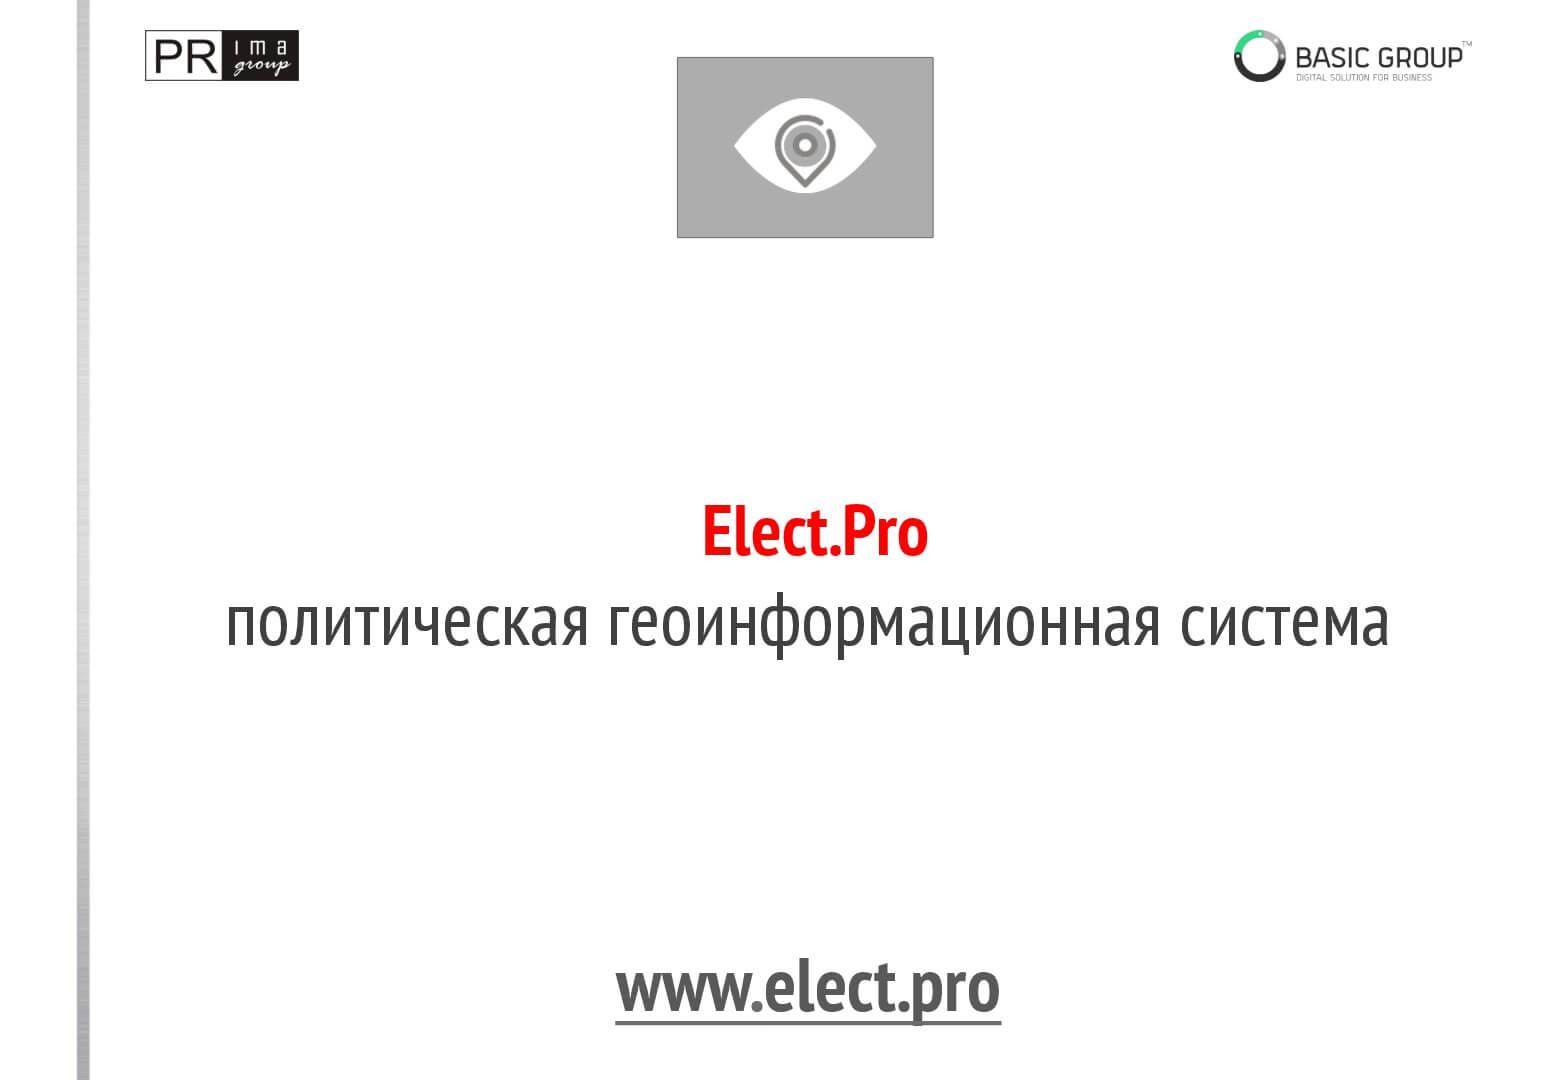 Elect.pro-BG-UA-001